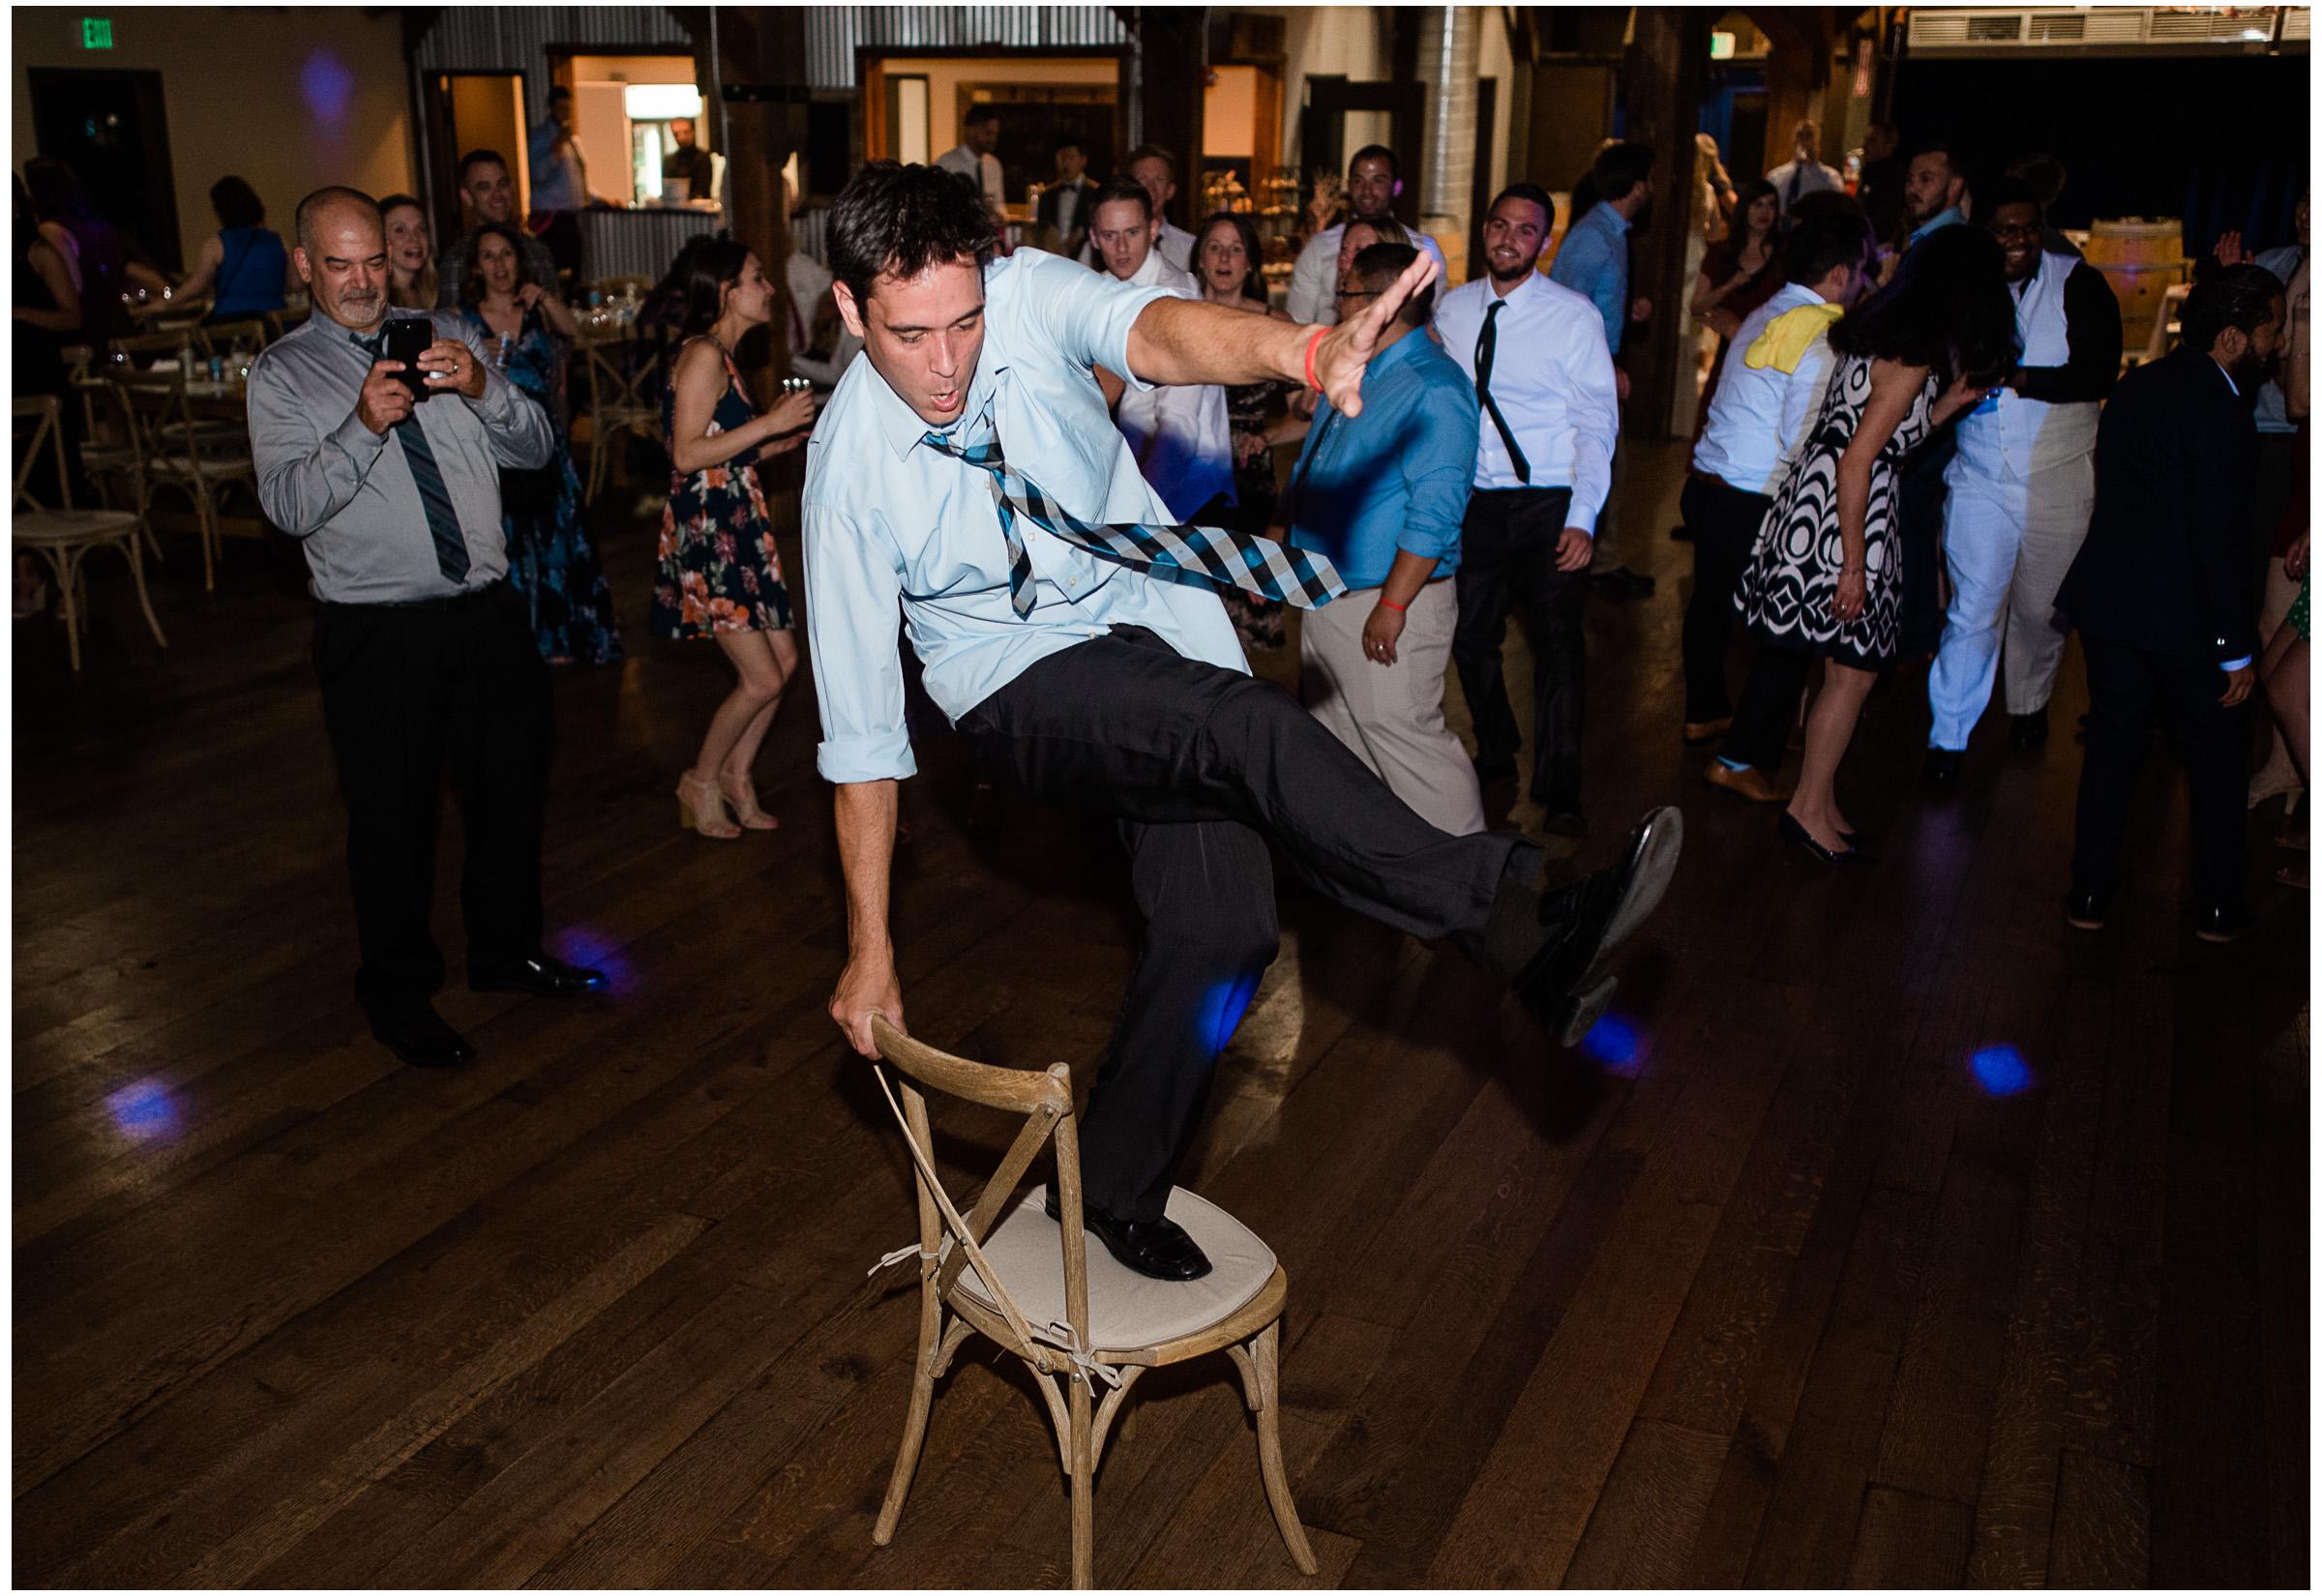 Loomis Wedding - Sacramento Photographer - Blue Goose - Justin Wilcox Photography - 26.jpg